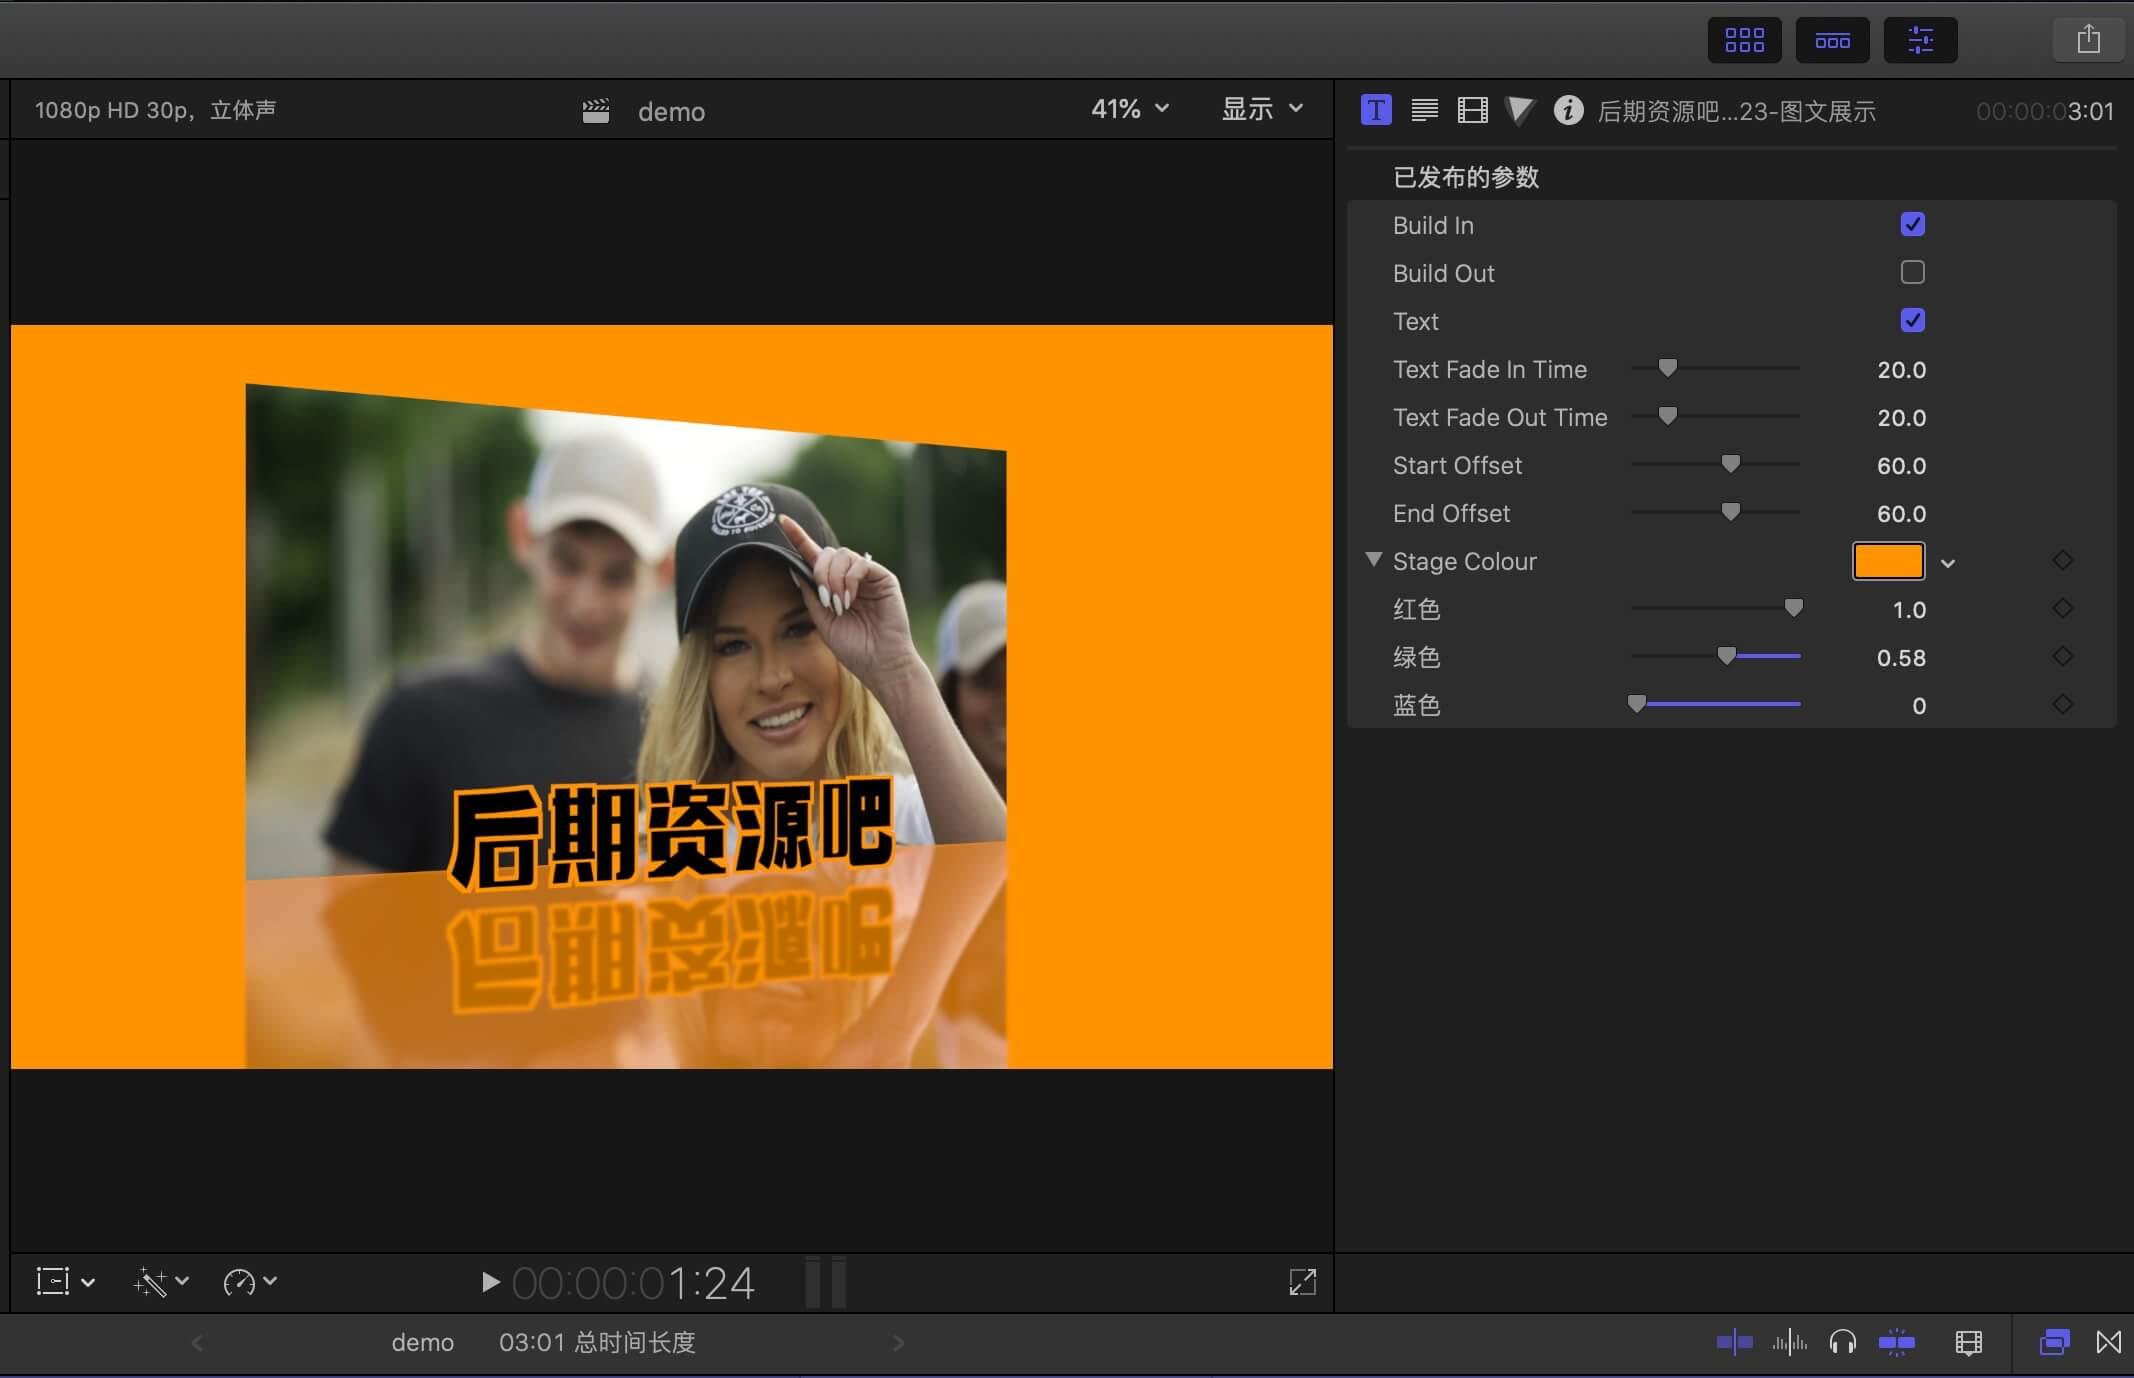 fcpx插件 图文视频添加舞台反射效果工具 Infinity Stage